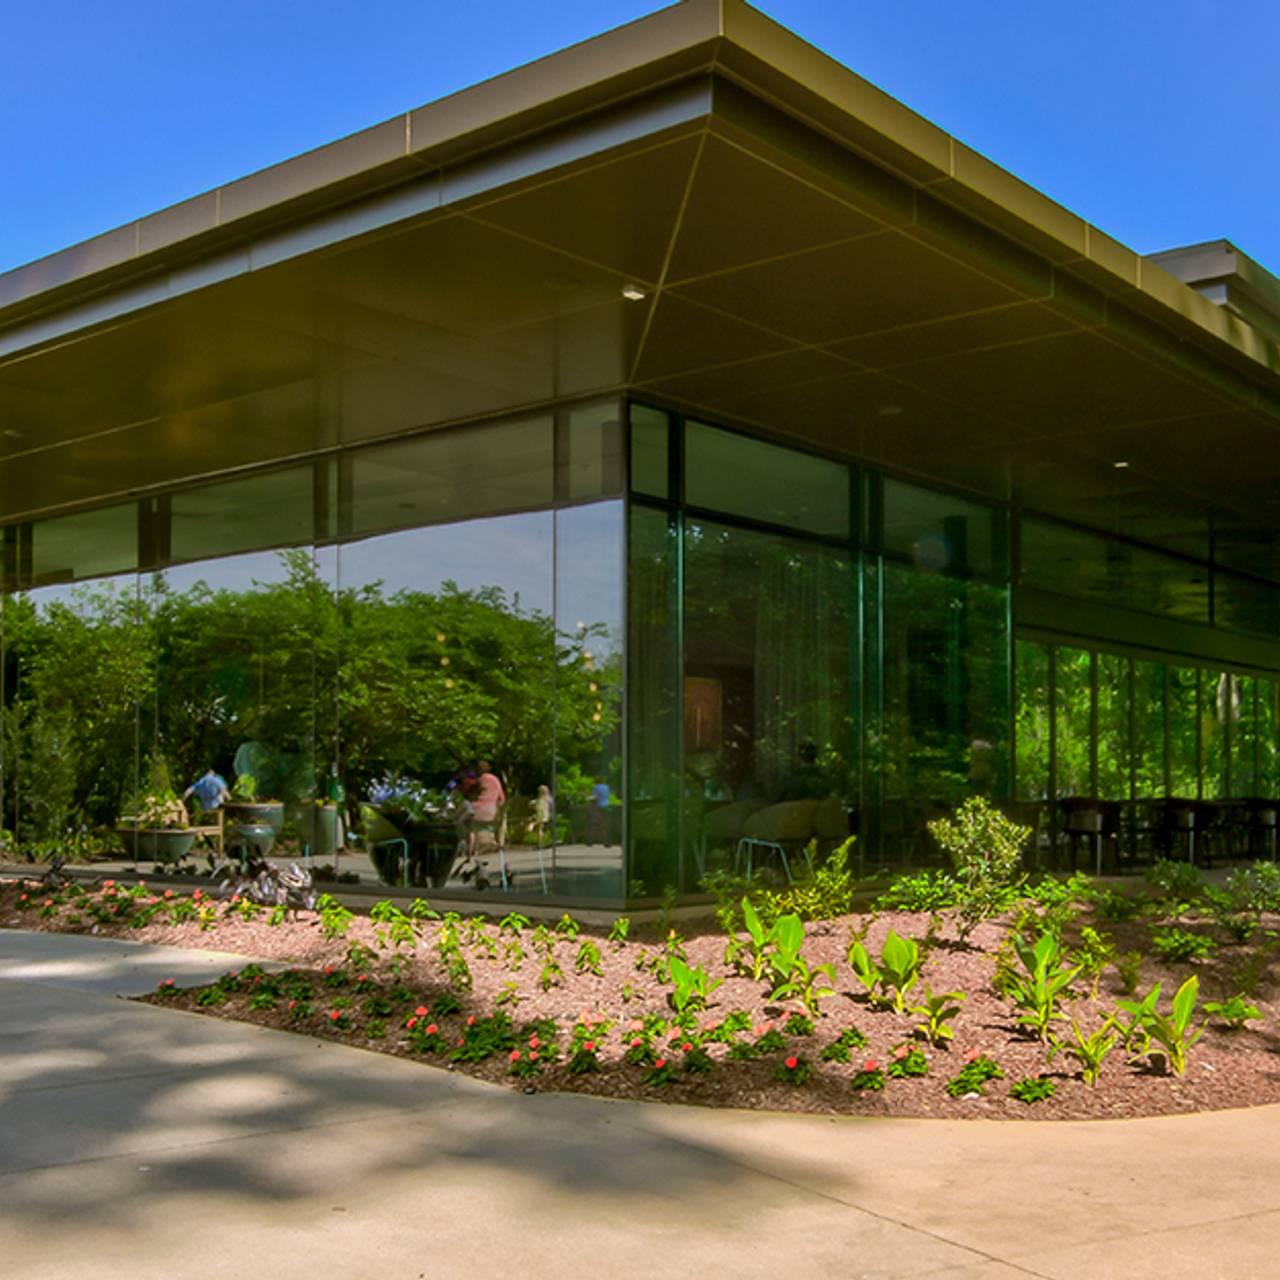 Atlanta Botanical Garden Storza Woods: Atlanta Botanical Garden Sage Parking